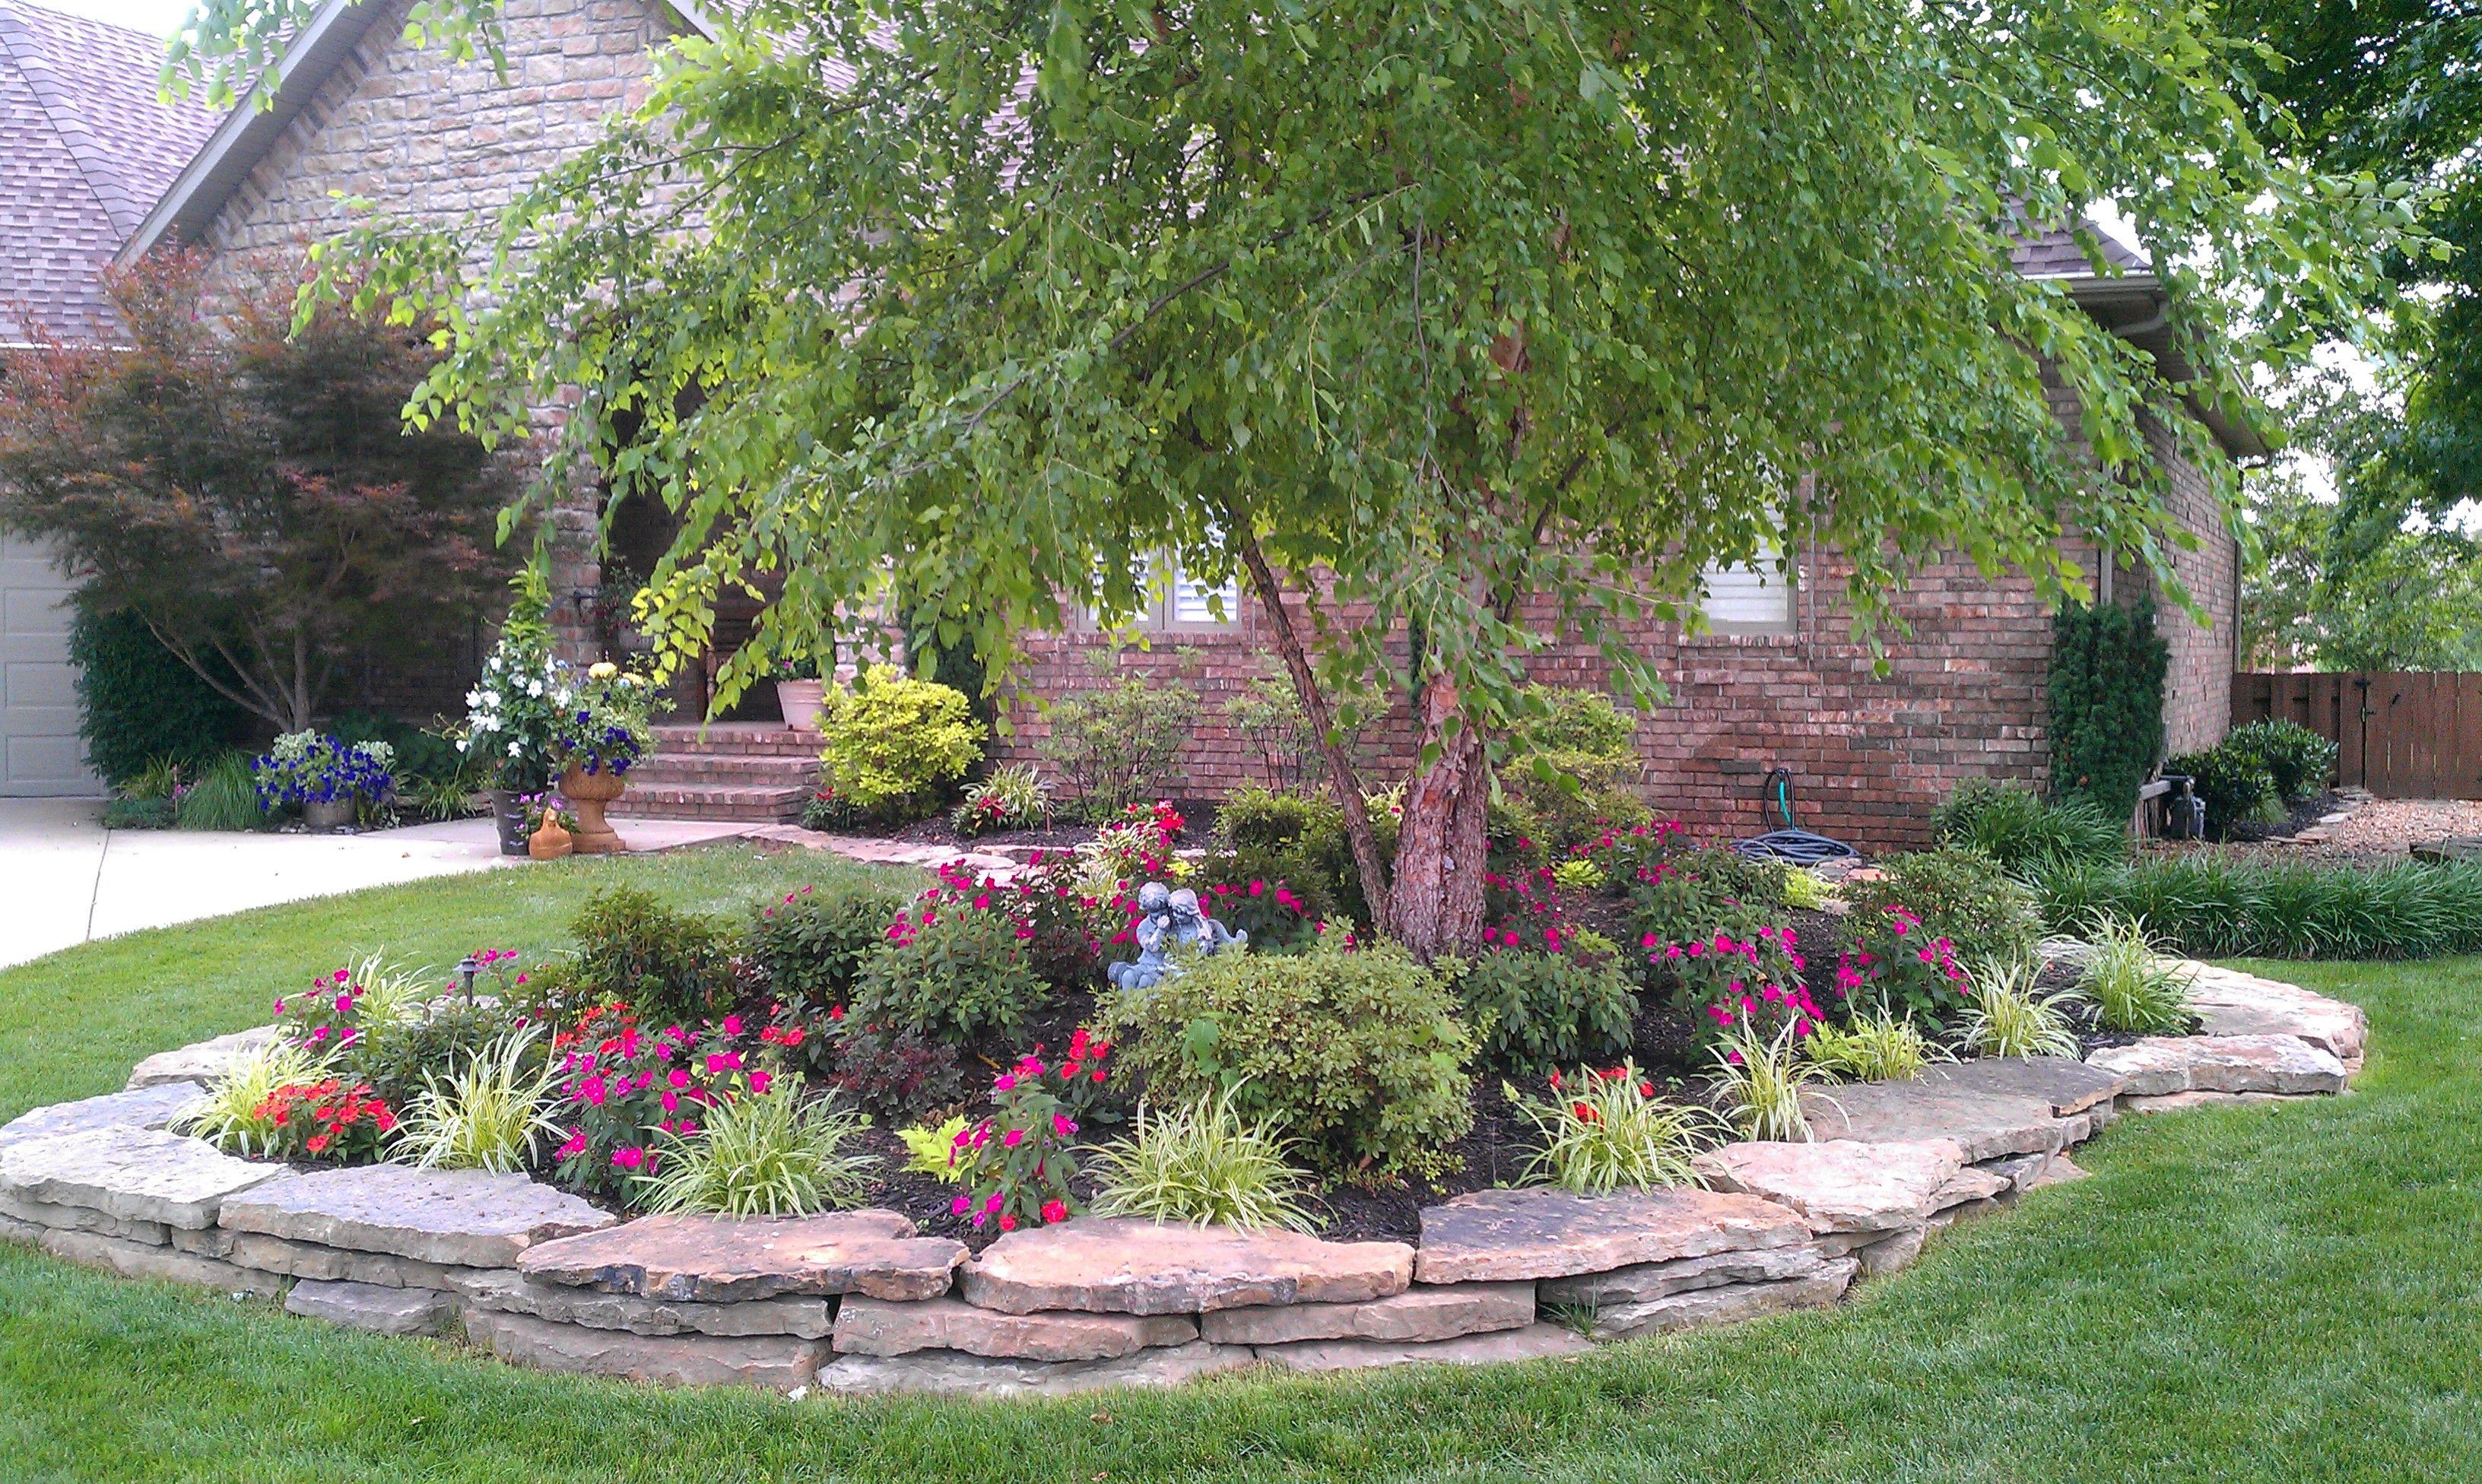 Best ideas about Diy Landscape Design . Save or Pin Diy Landscape Design For Beginners Now.